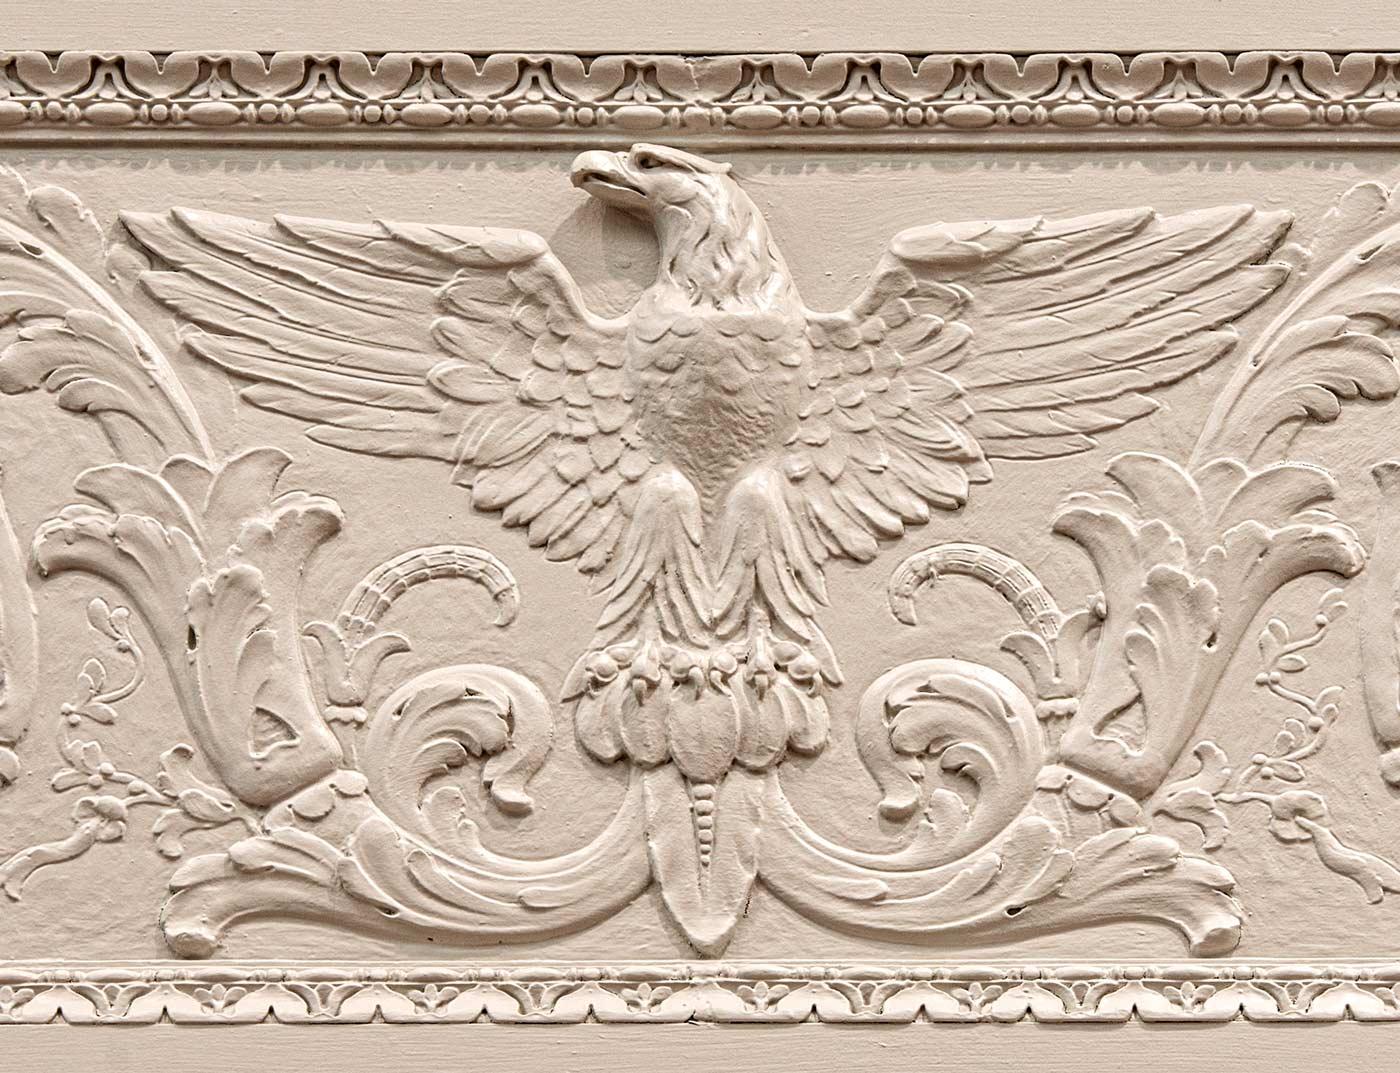 The Sidney M. Aronovitz U.S. Courthouse, Post Office and Custom